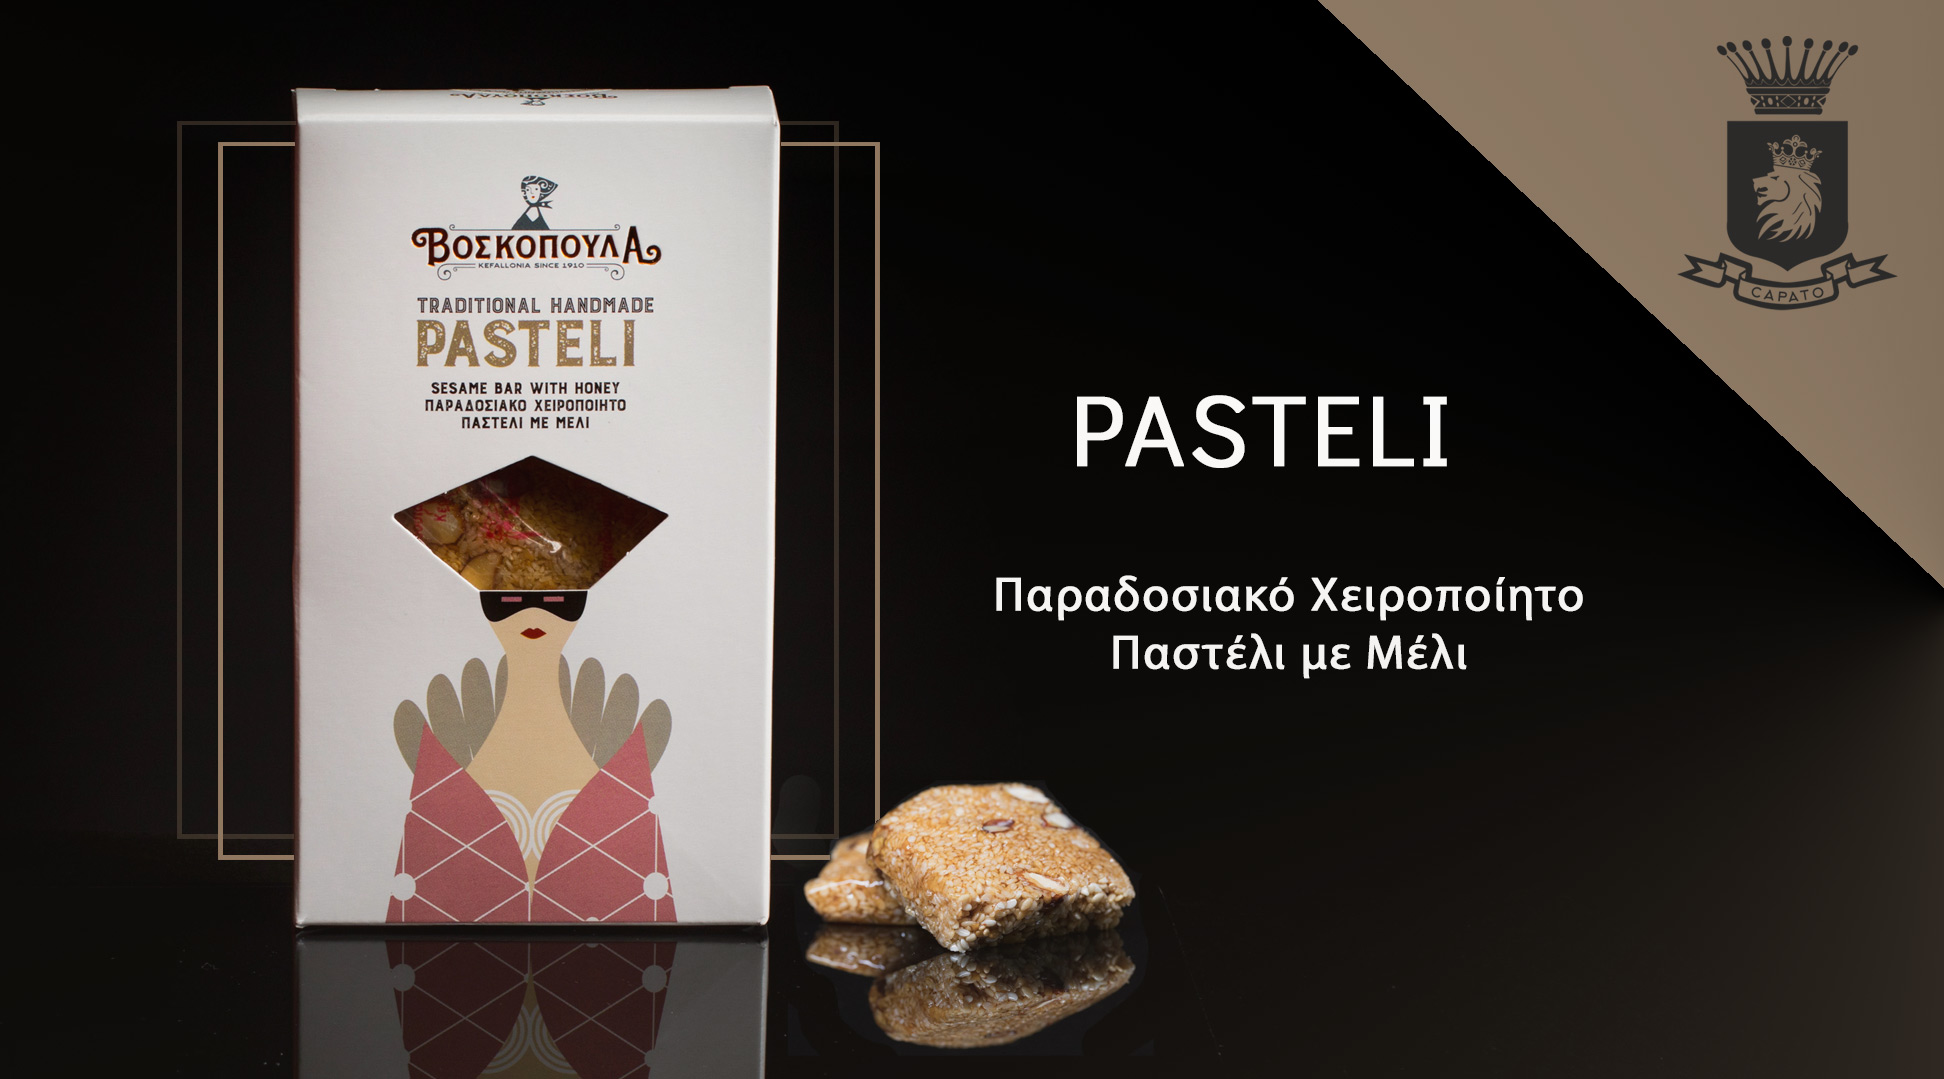 pasteli_kefalonia_homepage_el